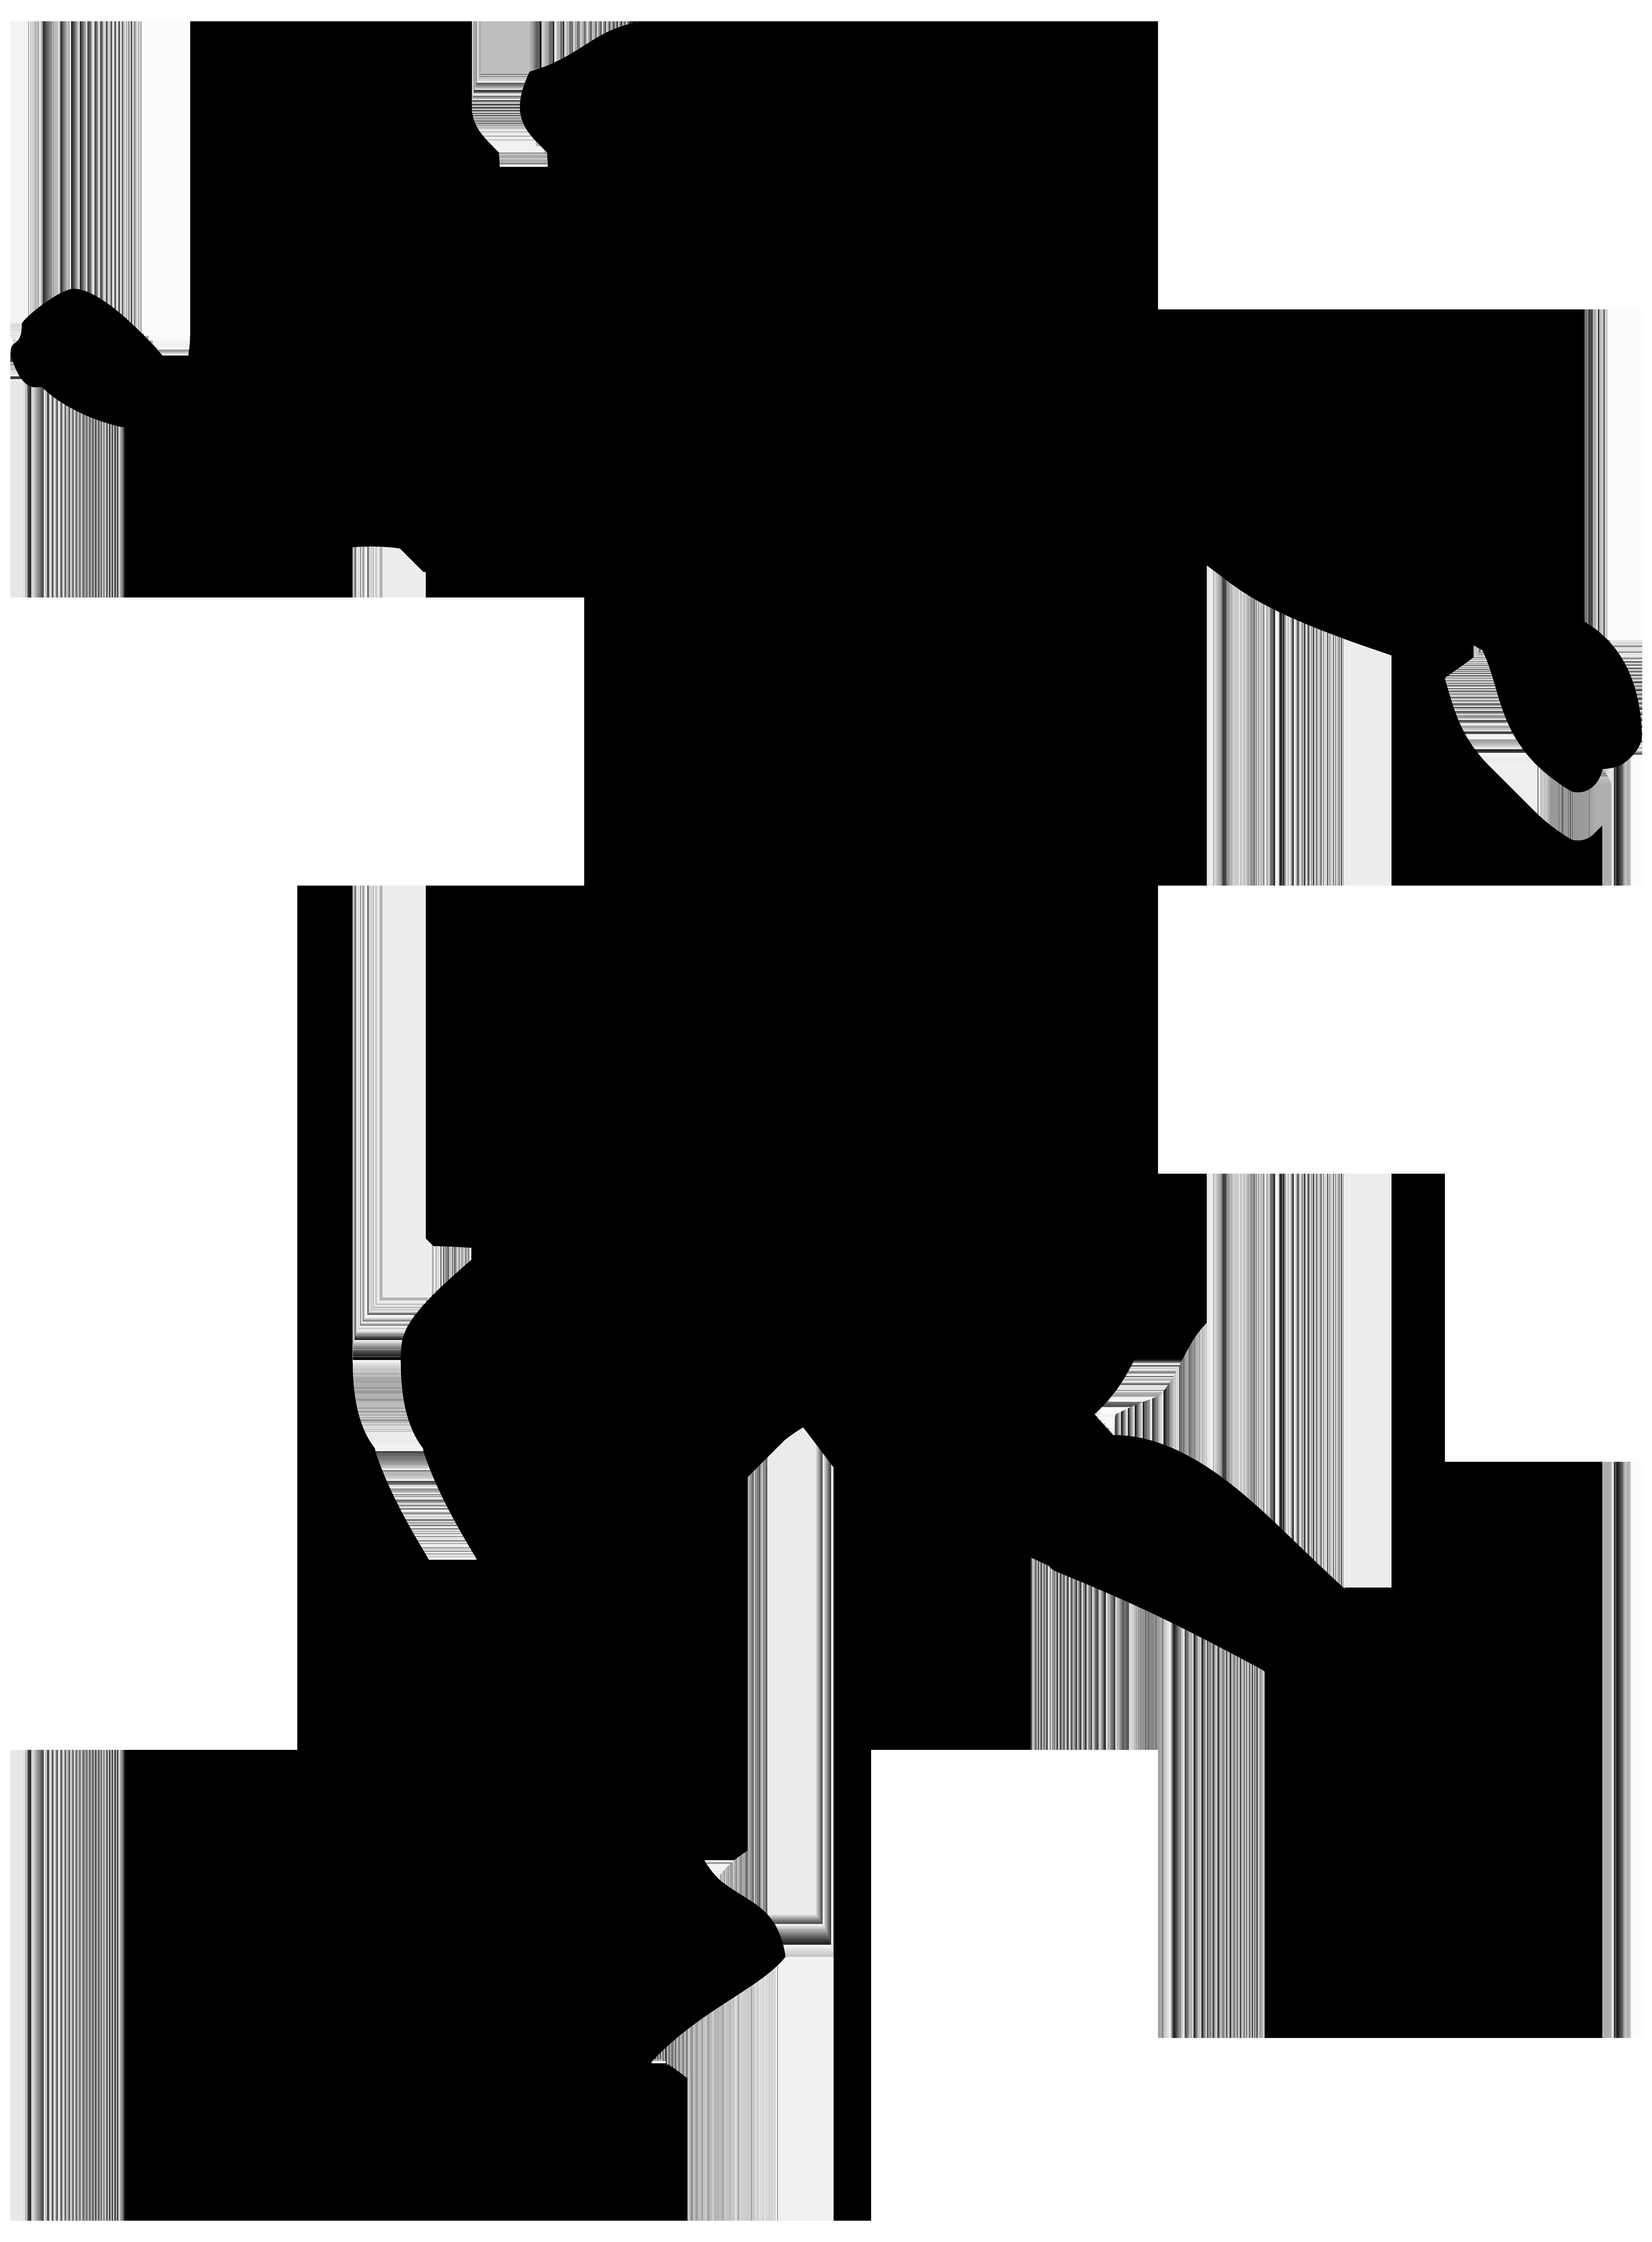 5896x8000 Silhouette Soccer Clipart, Explore Pictures